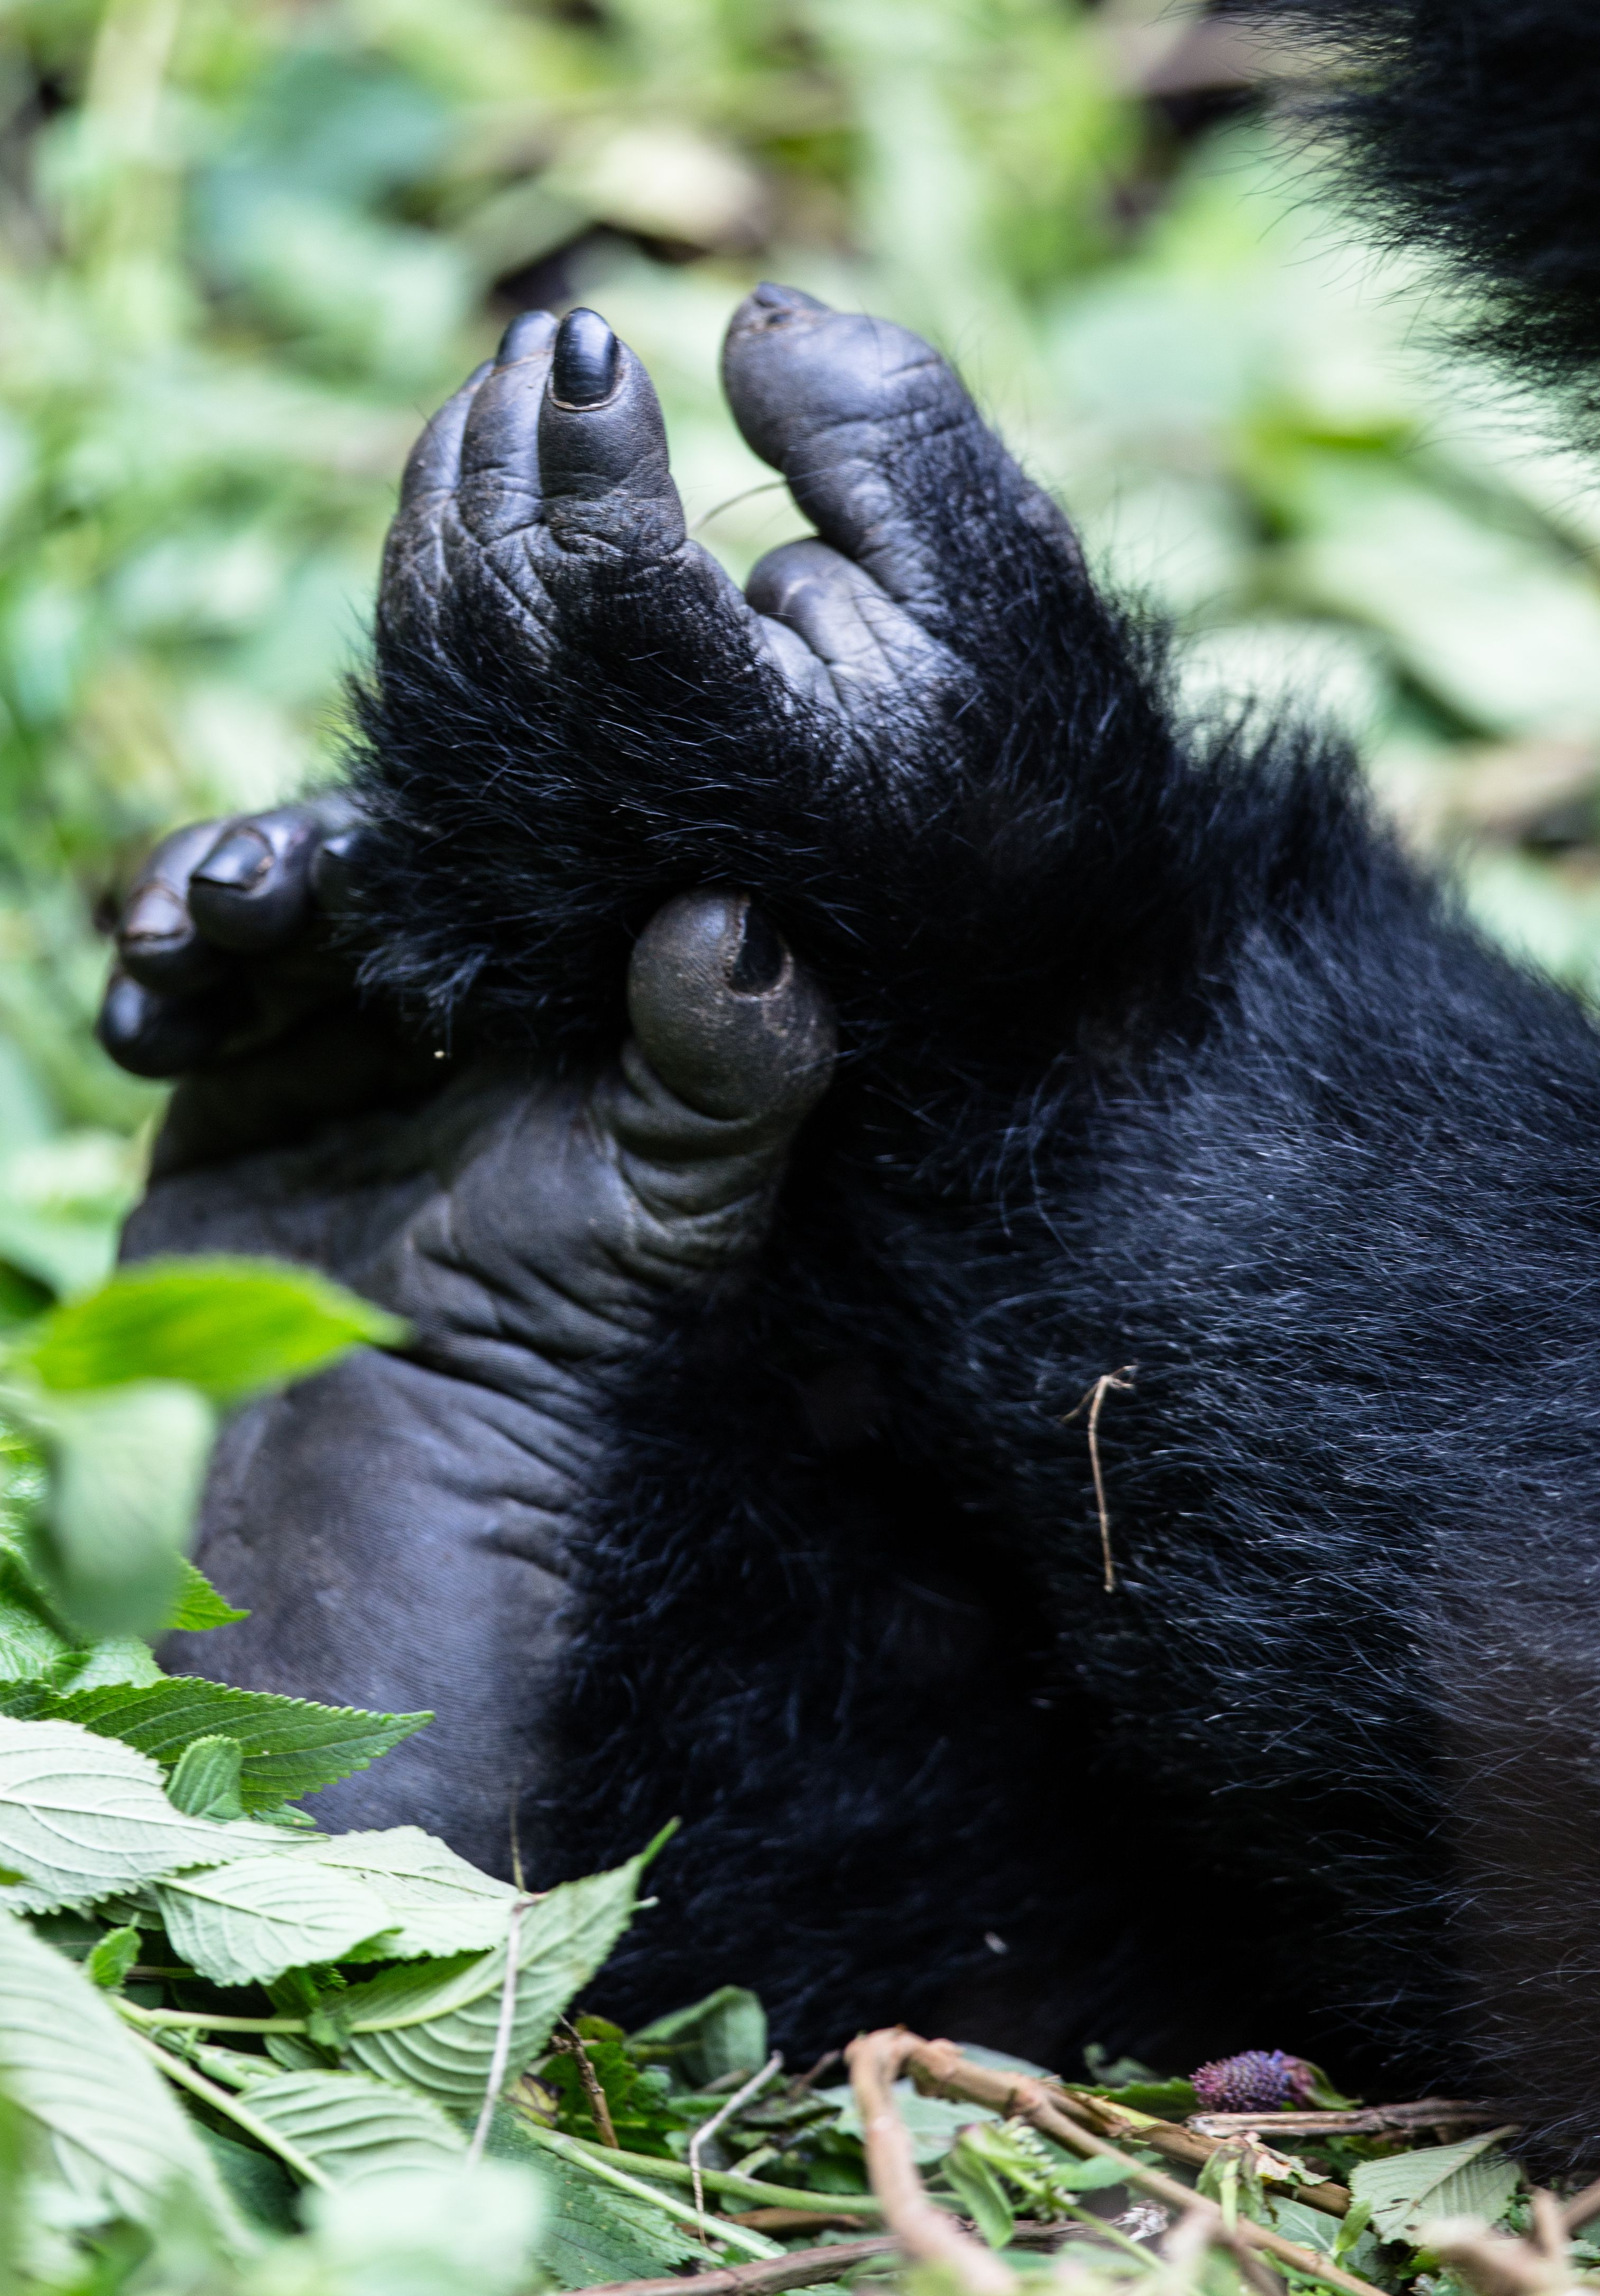 50 Gorillas, Chimps & Monkeys images   primates, gorilla, chimp